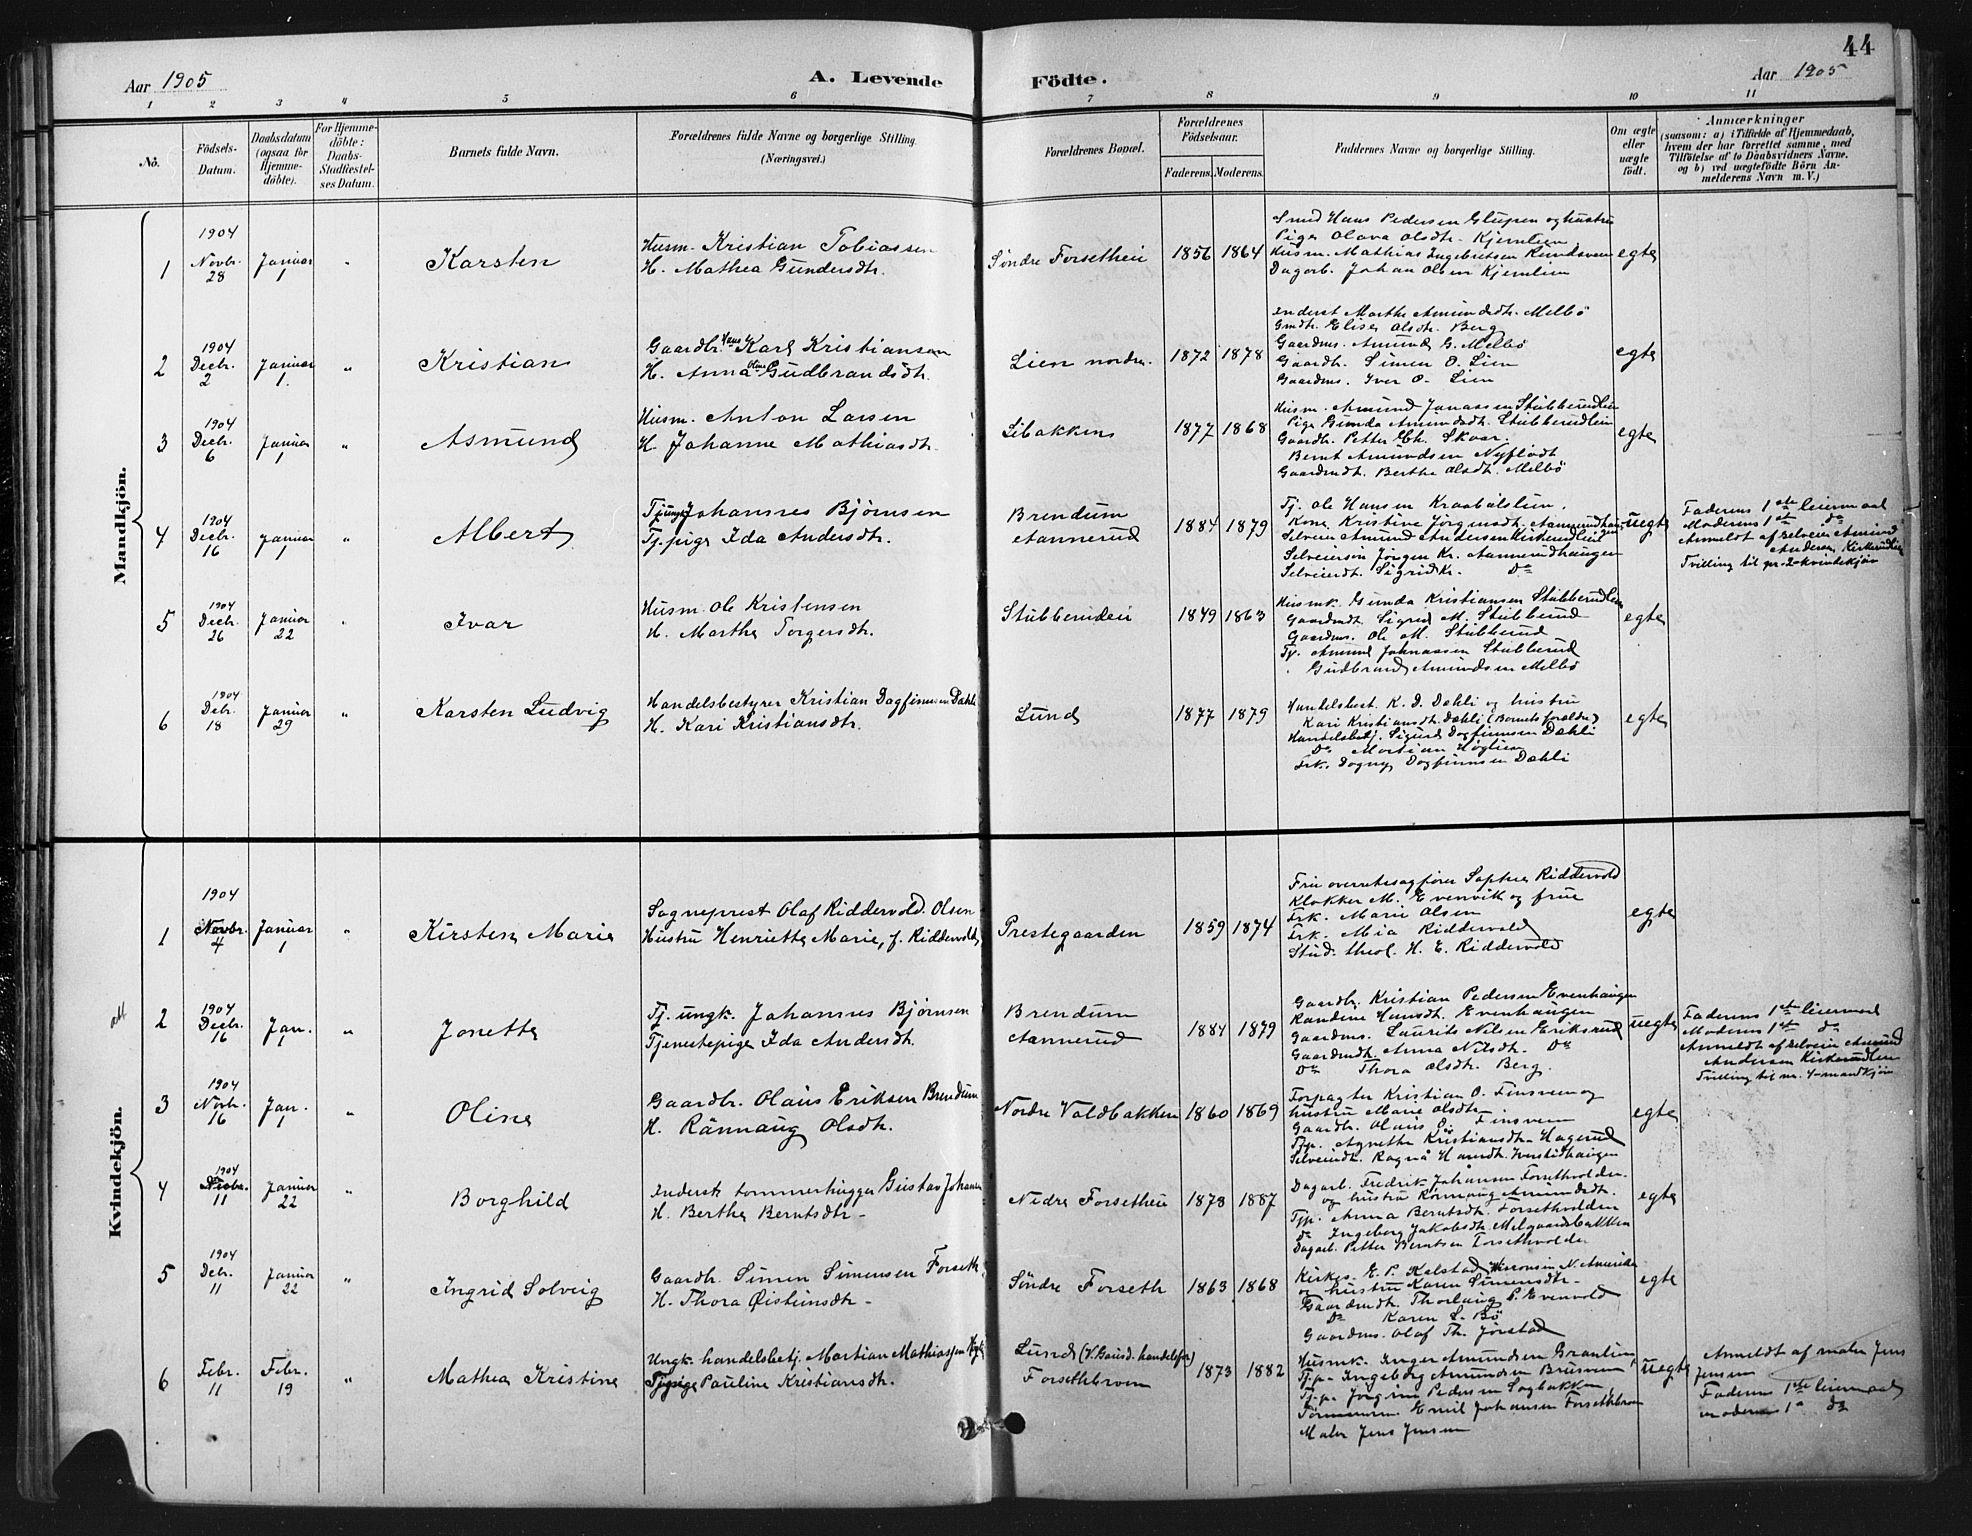 SAH, Vestre Gausdal prestekontor, Klokkerbok nr. 3, 1896-1925, s. 44